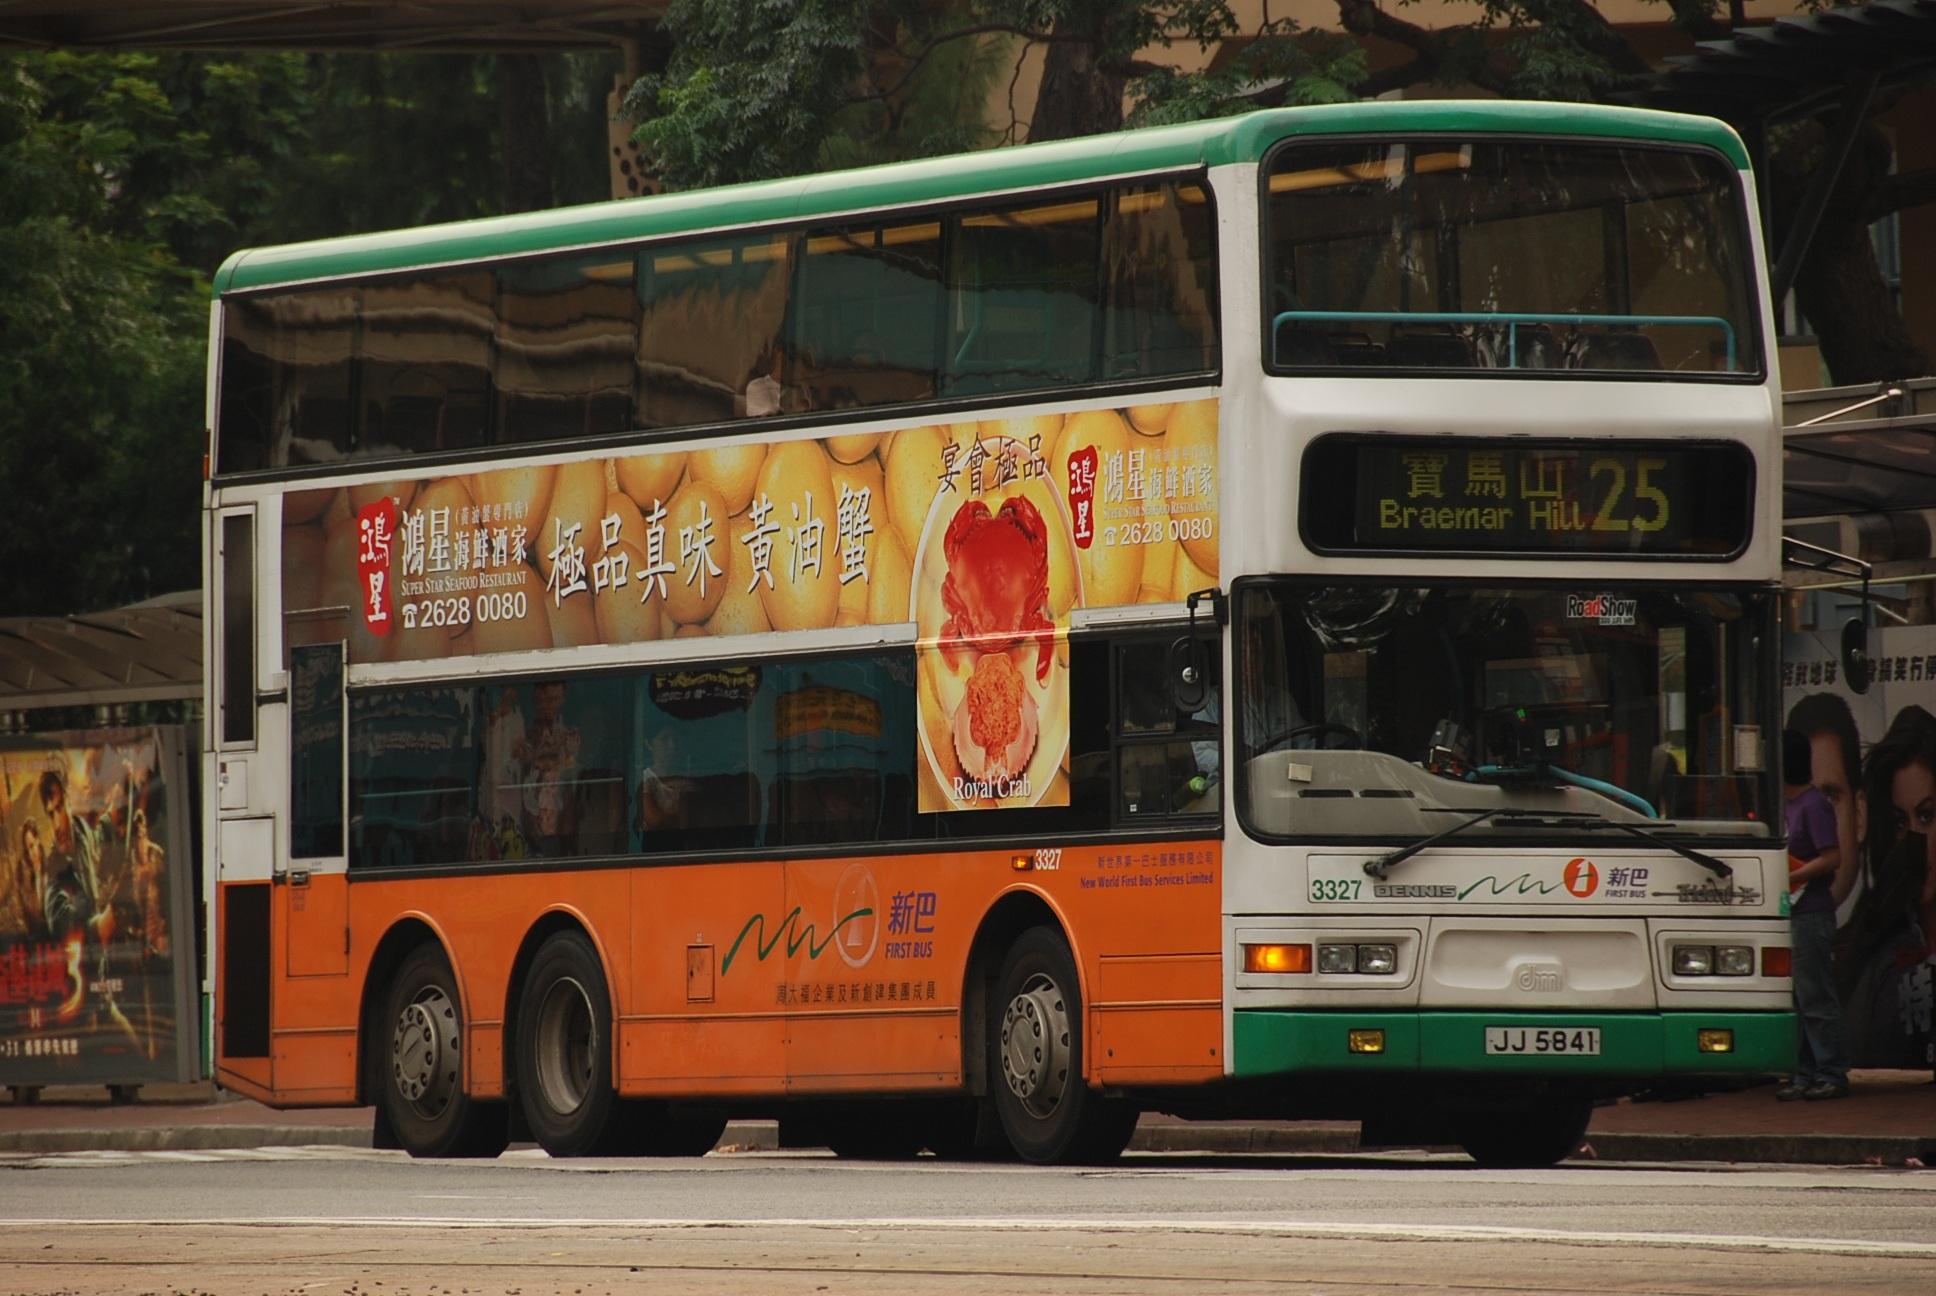 Free Images Travel Transit Transportation Journey Public Transport Hong Kong Tourists Mass Motorcoach Land Vehicle Mode Of Transport Metropolitan Area Tour Bus Service Motorbus 1936x1296 733947 Free Stock Photos Pxhere